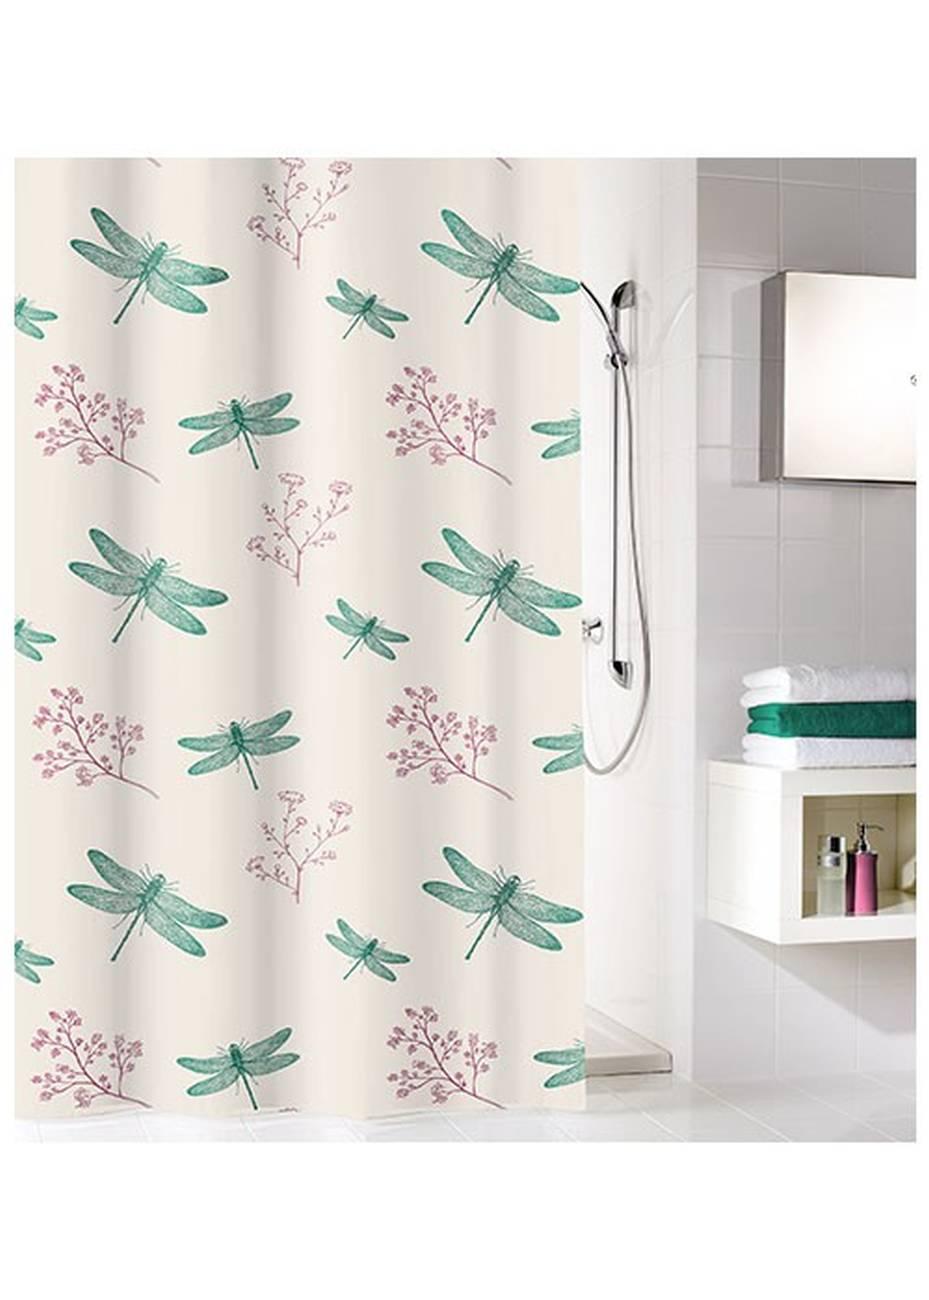 Duschvorhang Scarlett 100 % Polyester Smaragd 180x200 cm